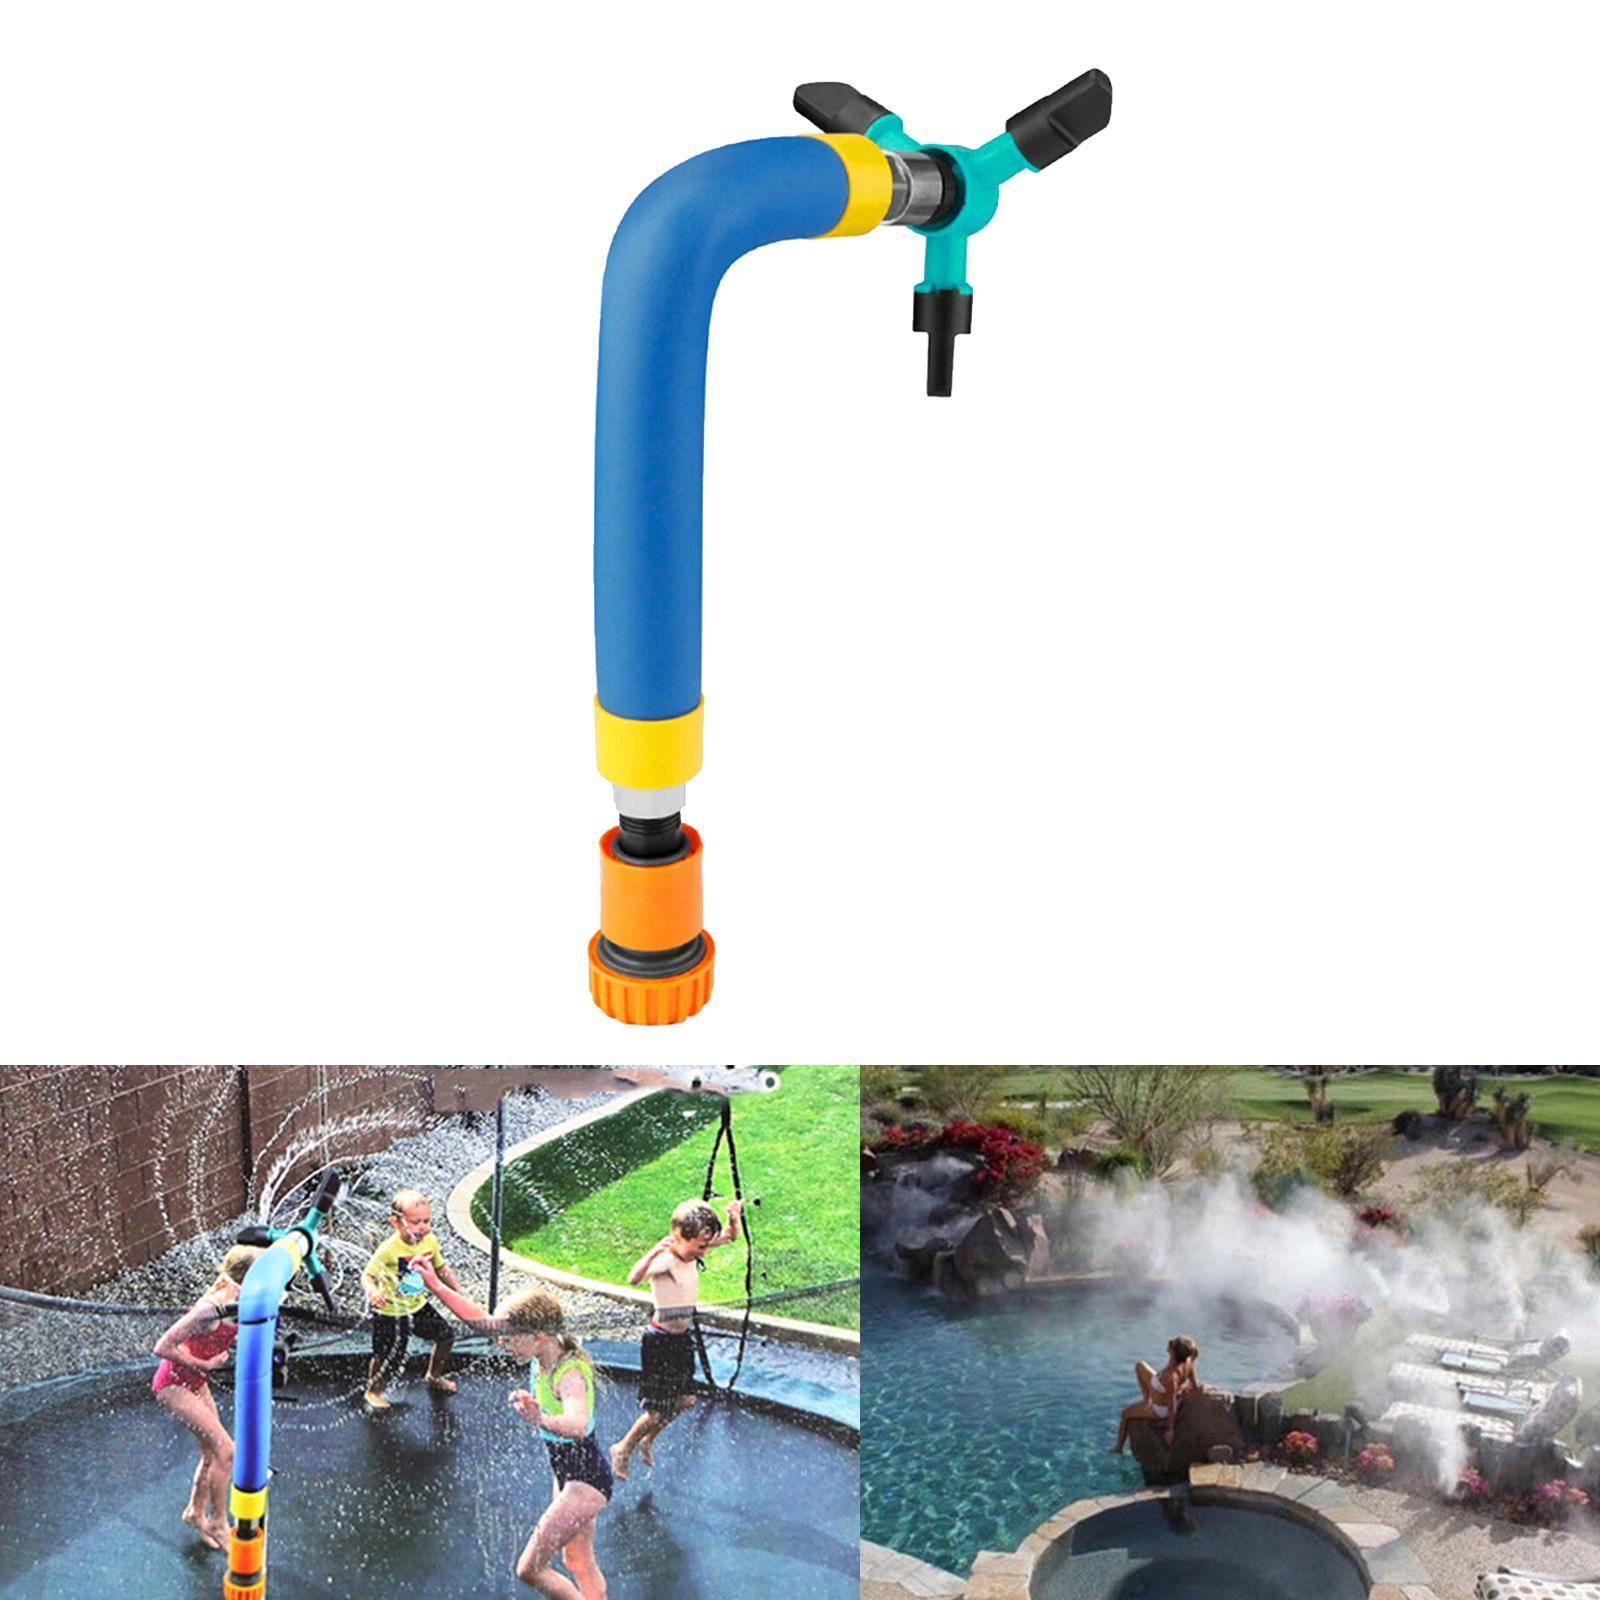 miniatura 6 - Trampolino di Acqua Sprinkler A Spruzzo Nebbia Giardino Estate Giochi